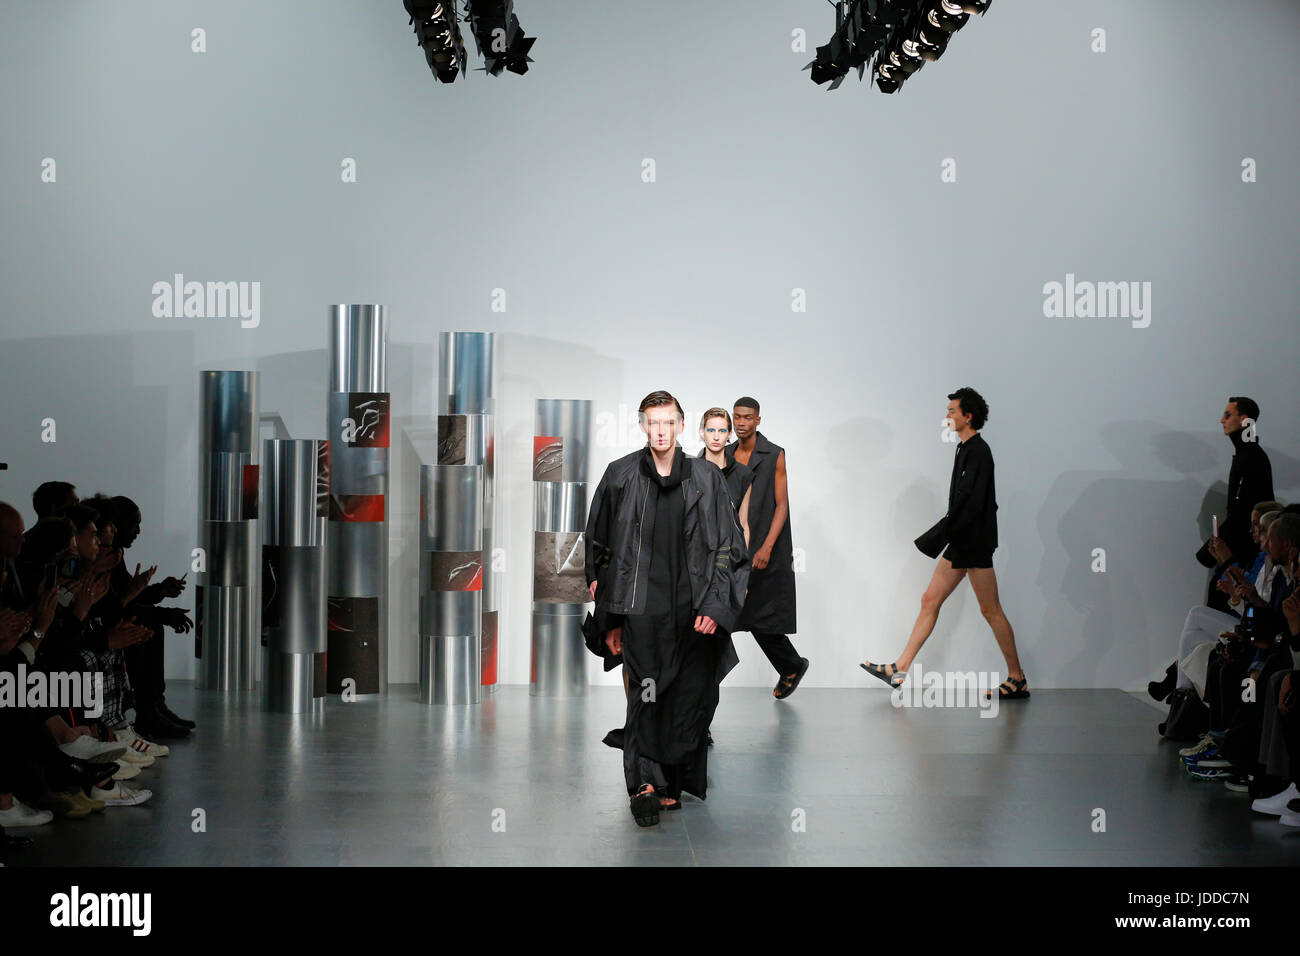 British Designer Berthold Catwalk At London Fashion Week Summer Stock Photo Alamy